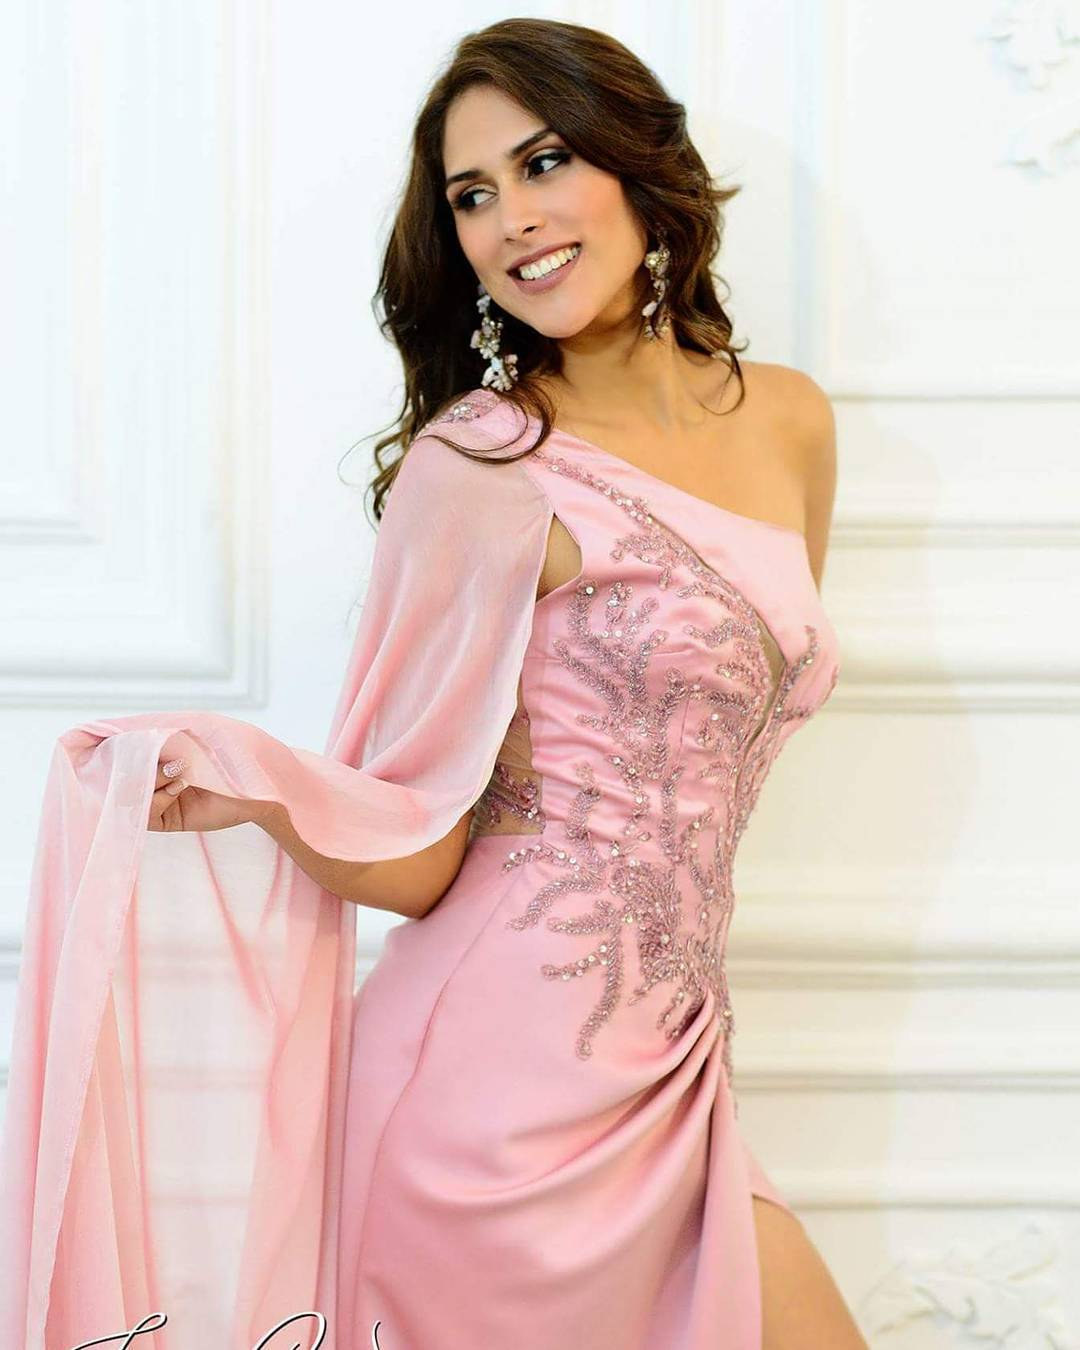 melody calderon, candidata a miss peru universo 2019/primera finalista reyna mundial banano 2018. 22710411